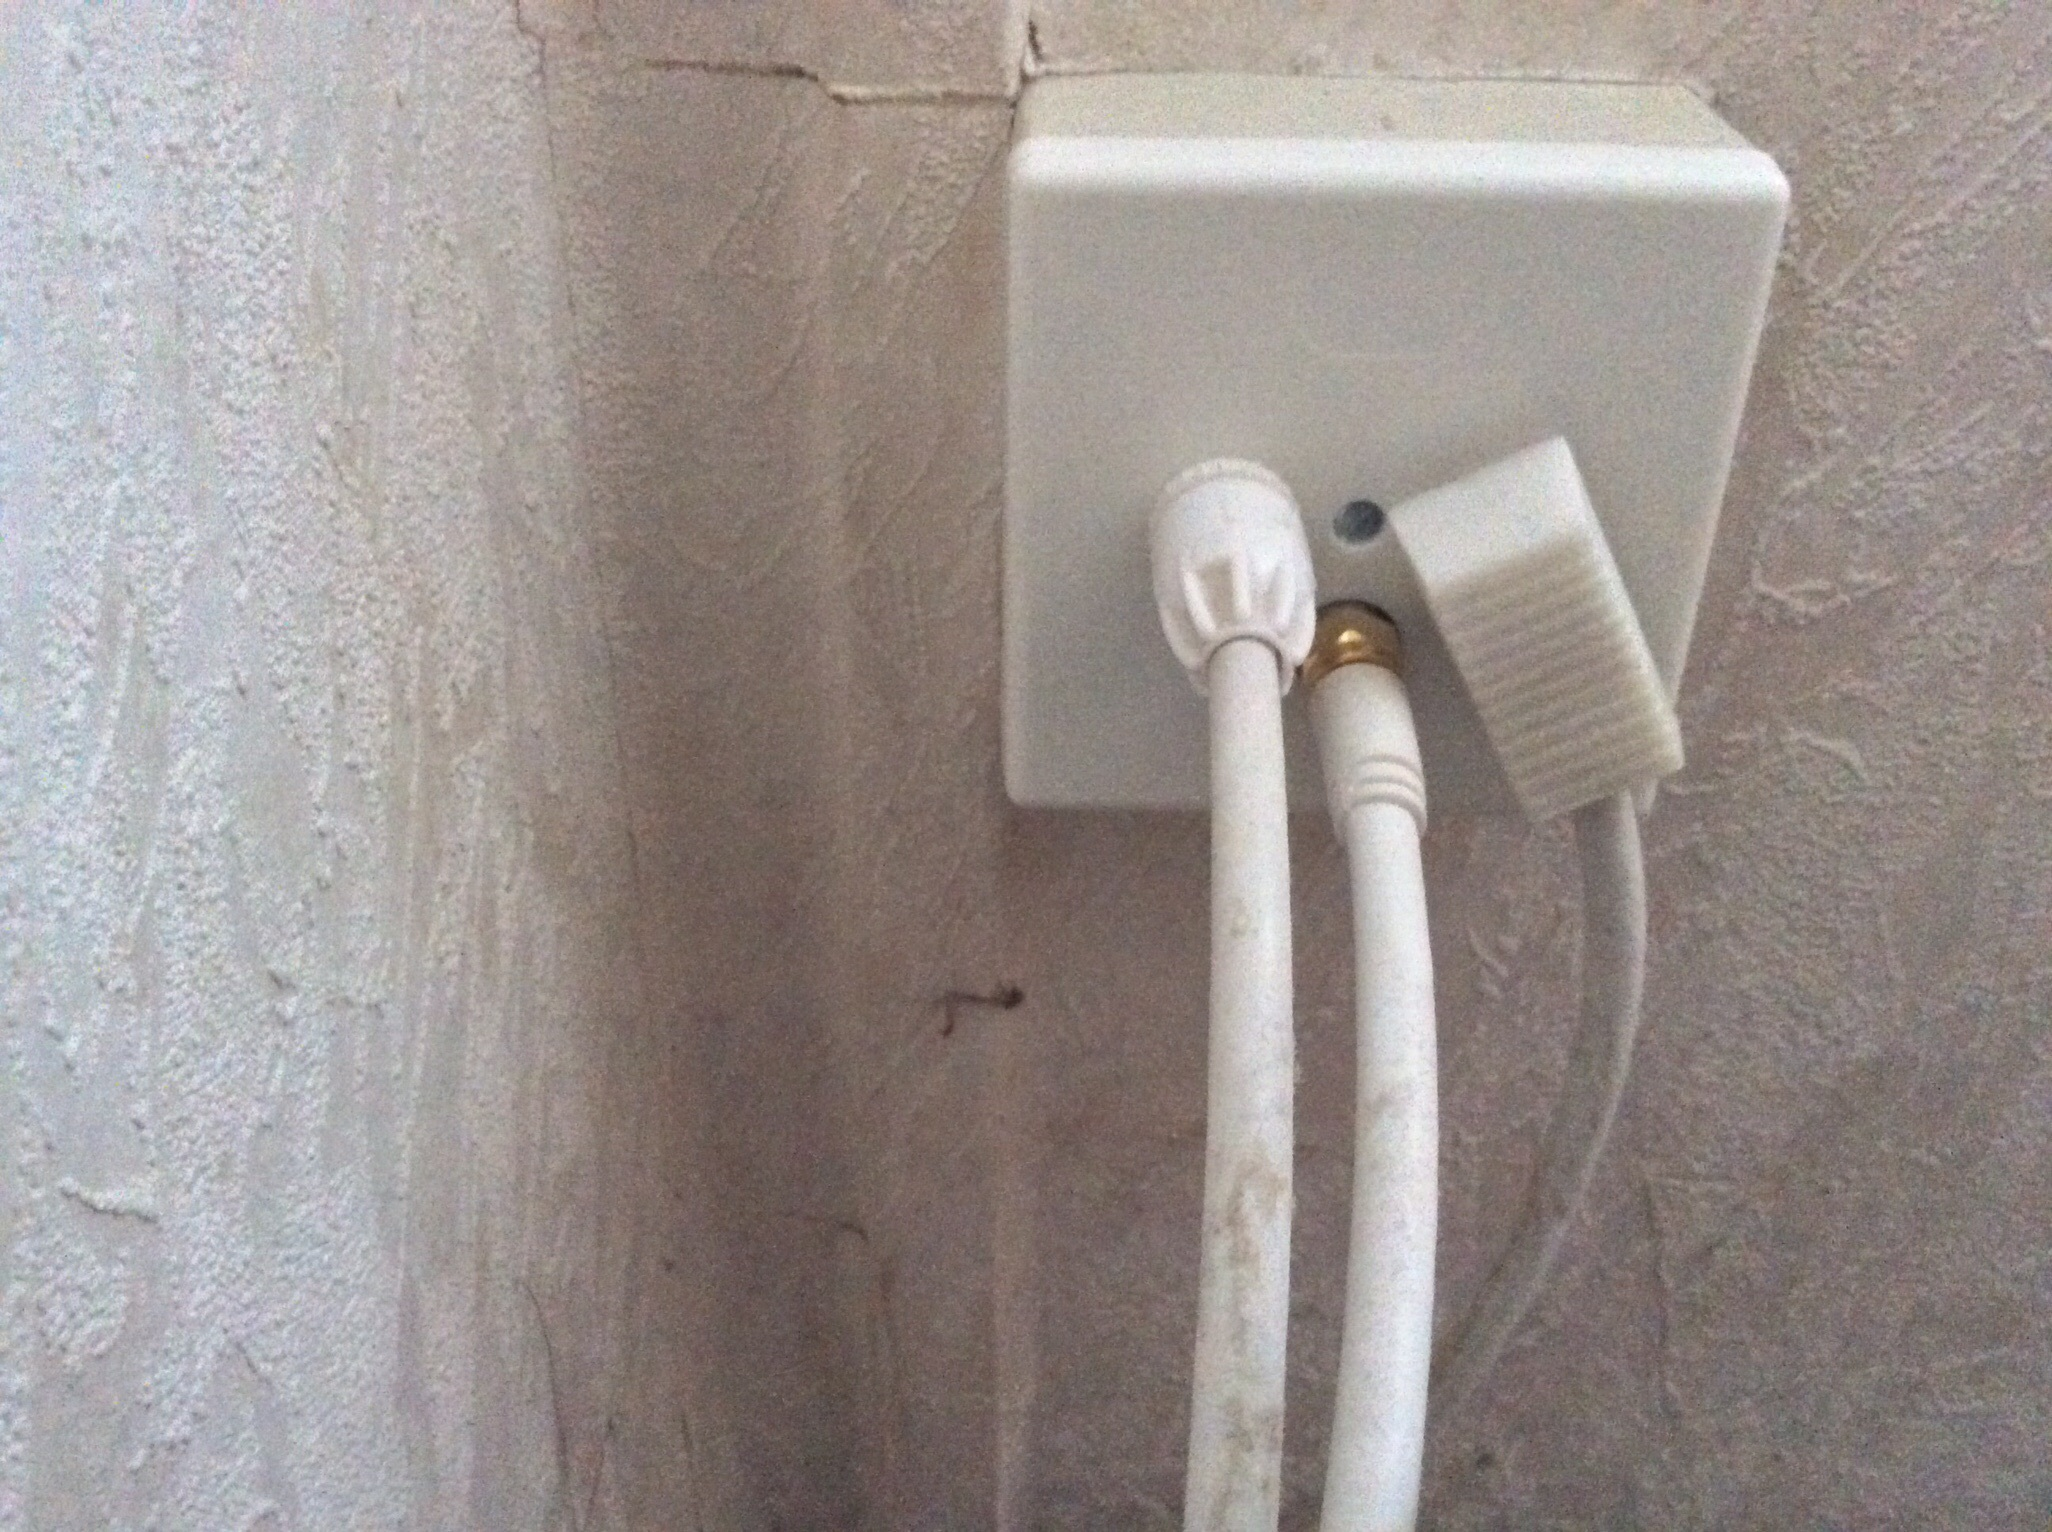 private techniker um modem werte zu verbessren. Black Bedroom Furniture Sets. Home Design Ideas